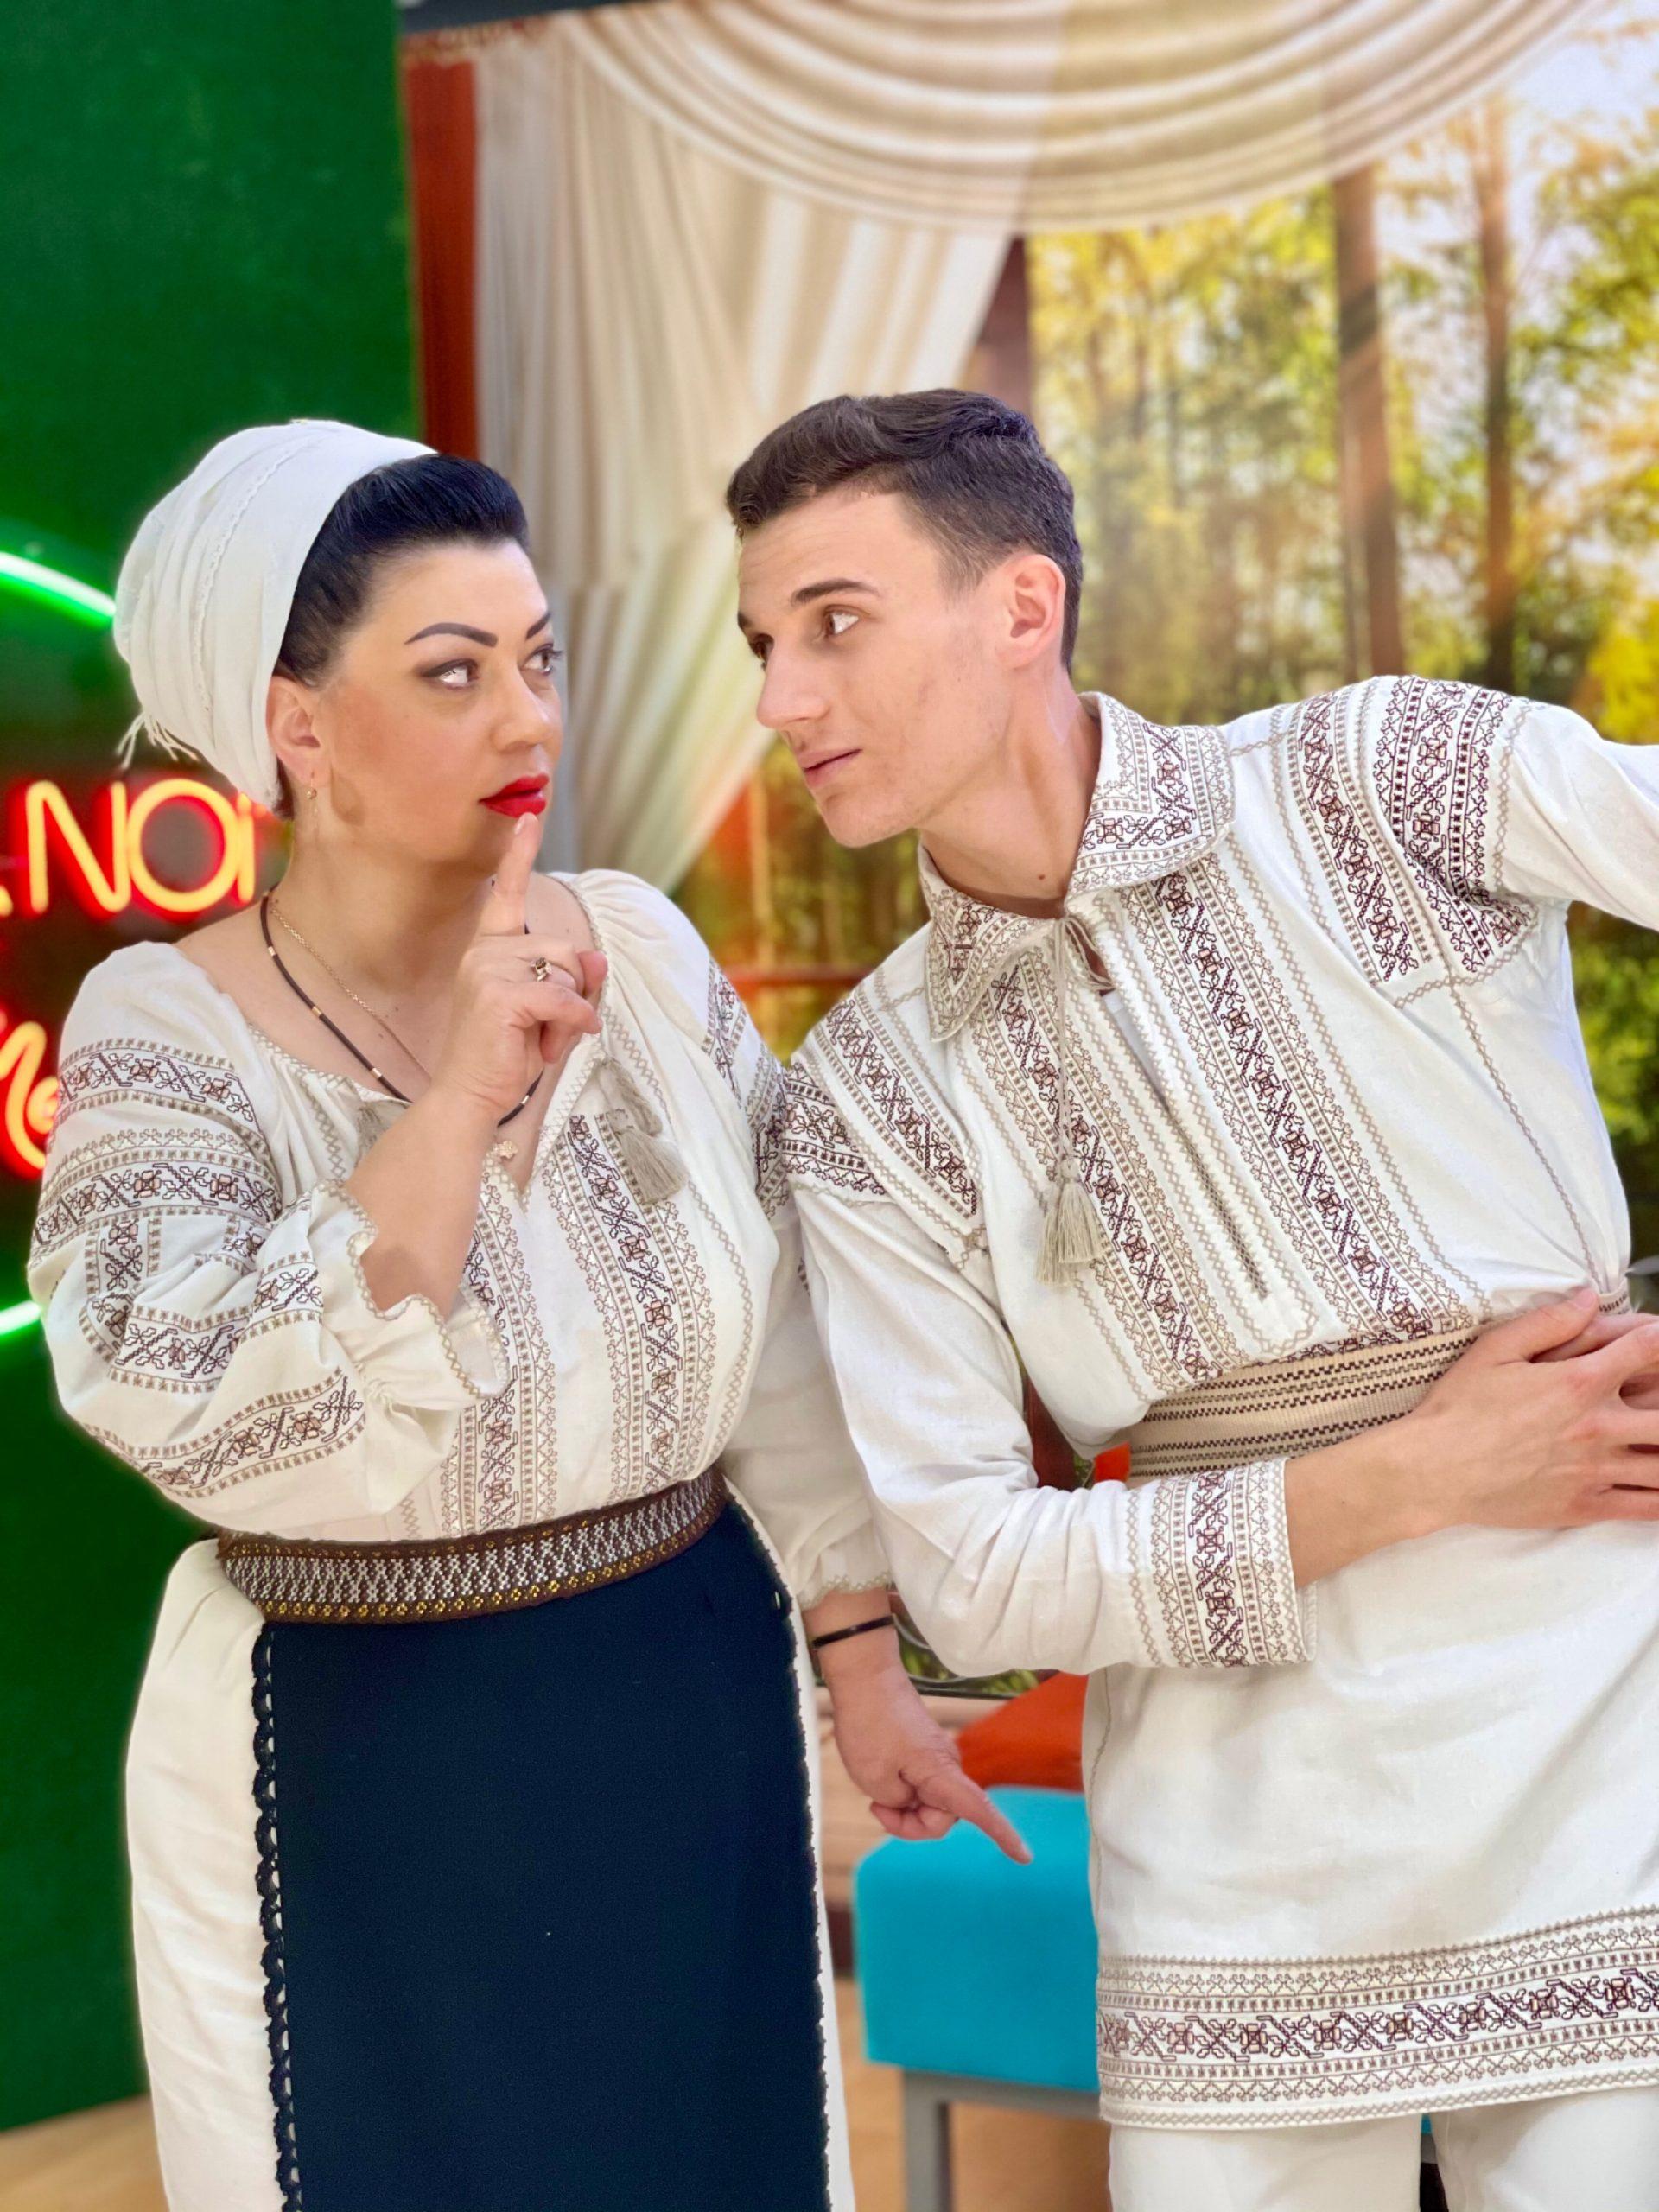 """𝗣𝗼𝗳𝘁𝗶𝗺 𝗹𝗮 𝗡𝗼𝗶"" 𝗰𝘂 𝗗𝗼𝗶𝗻𝗮 ș𝗶 𝗡𝗲𝗕𝘂𝗻𝘂 – Invitați:  MC Gootsa & Colectivul Artistic ""Iscon"""